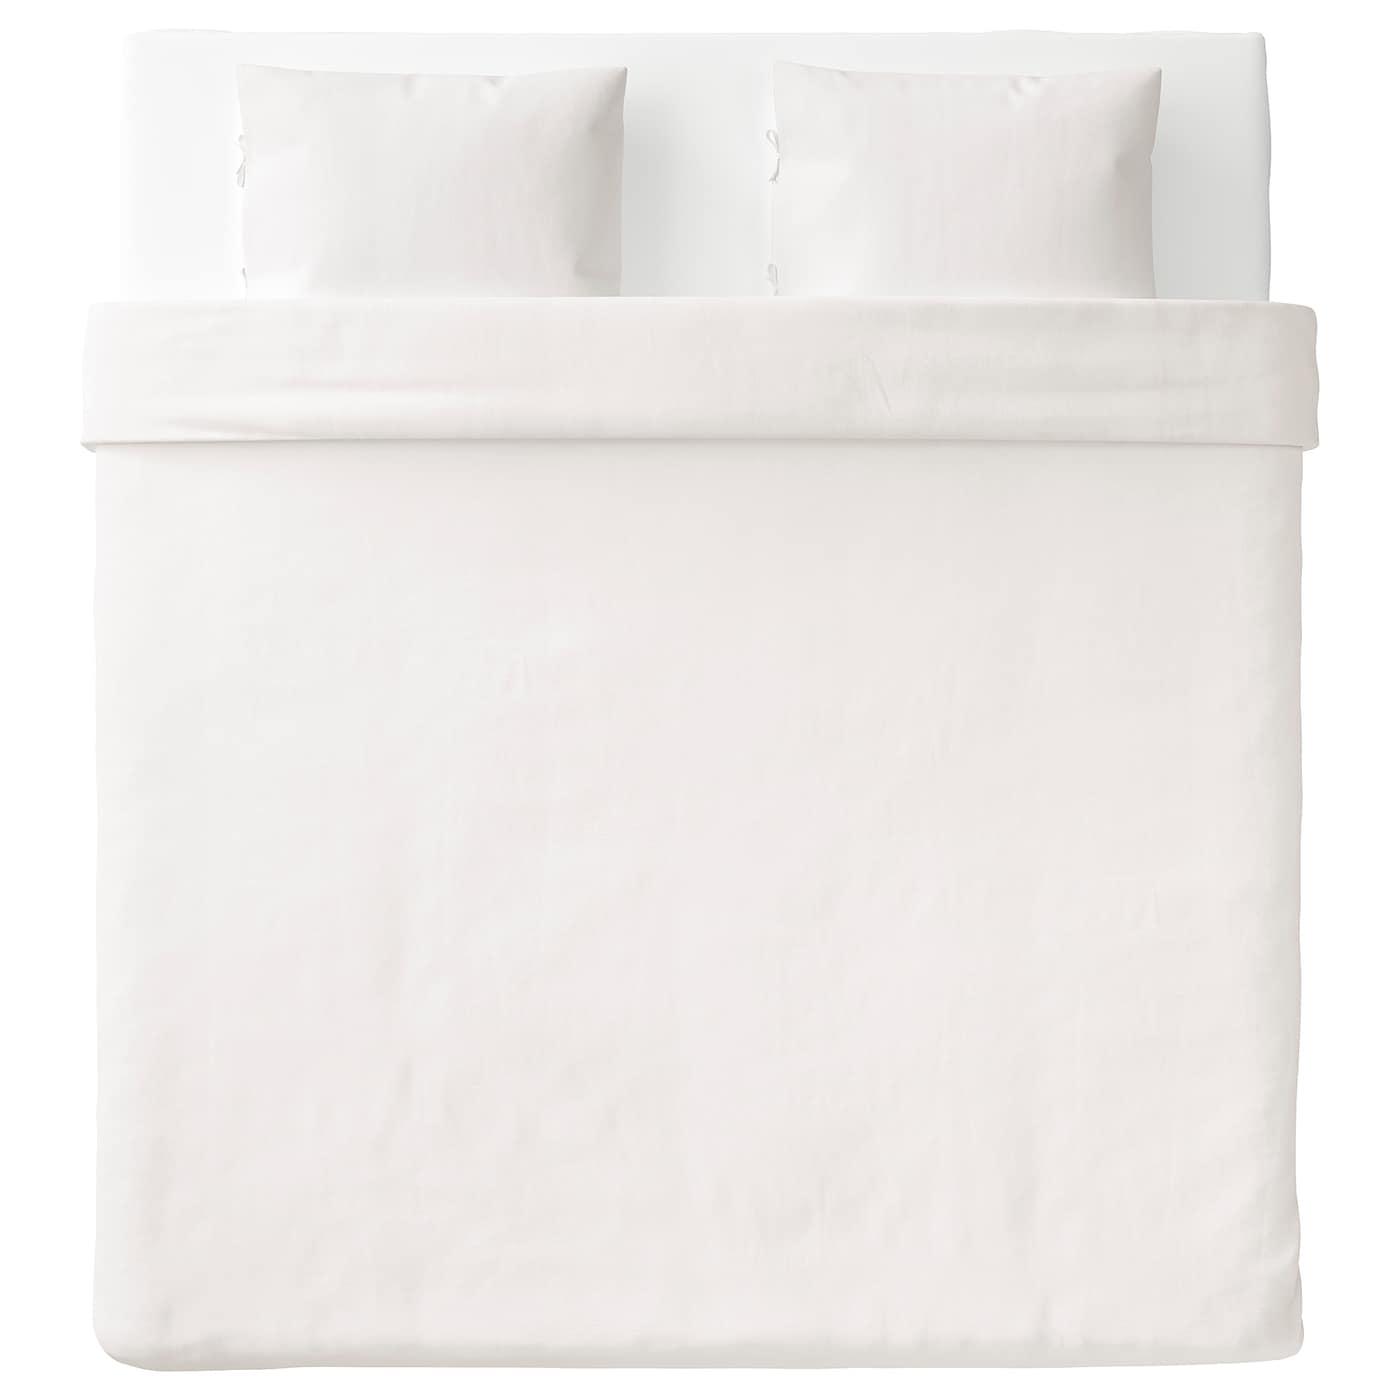 PUDERVIVA Funda nórd y 2 fundas almohada Blanco 260 x 220/50 x 60